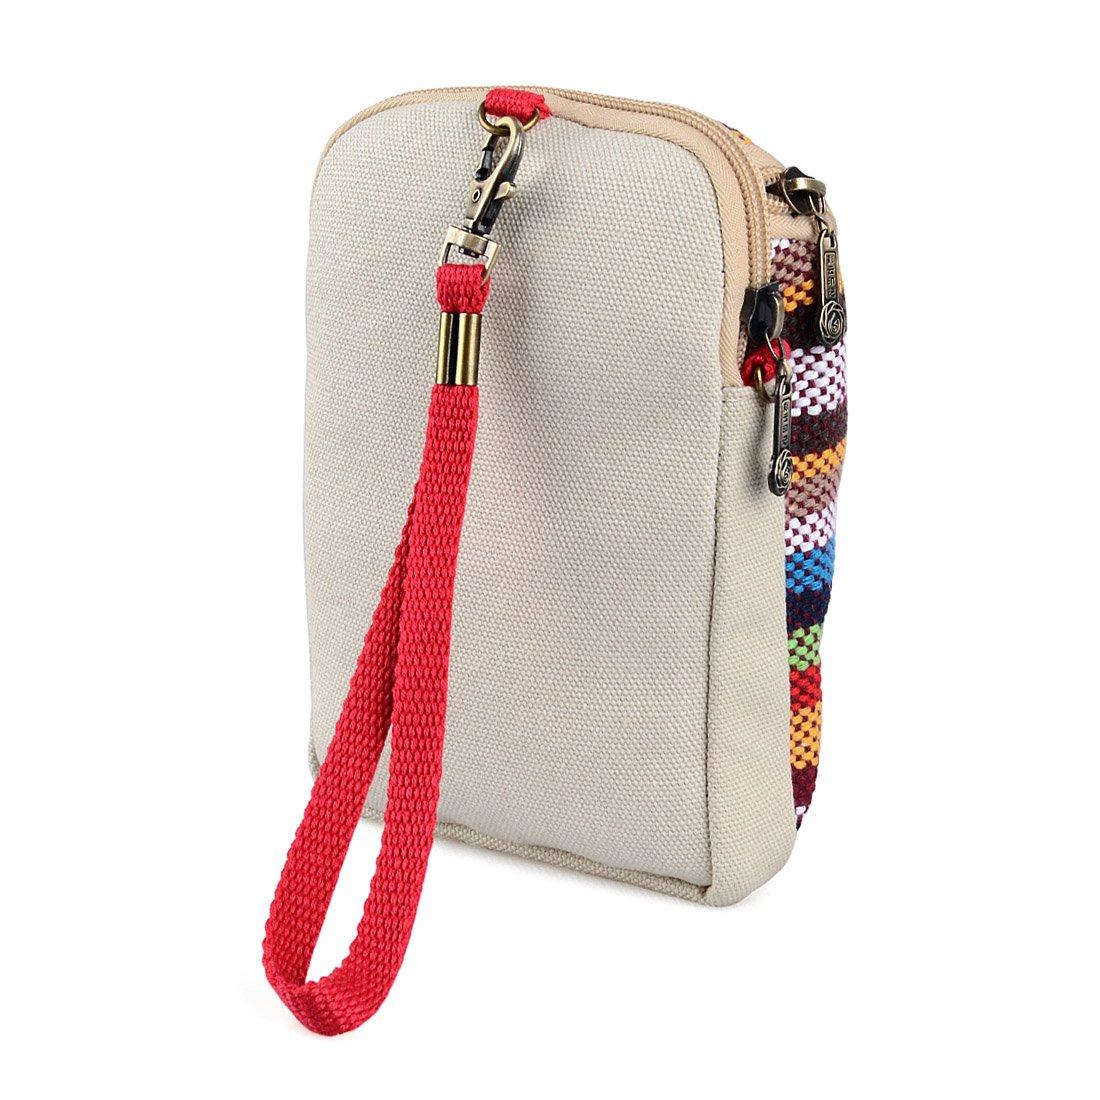 Amazon.com: Jiyaru - Bolso bandolera para mujer, diseño ...